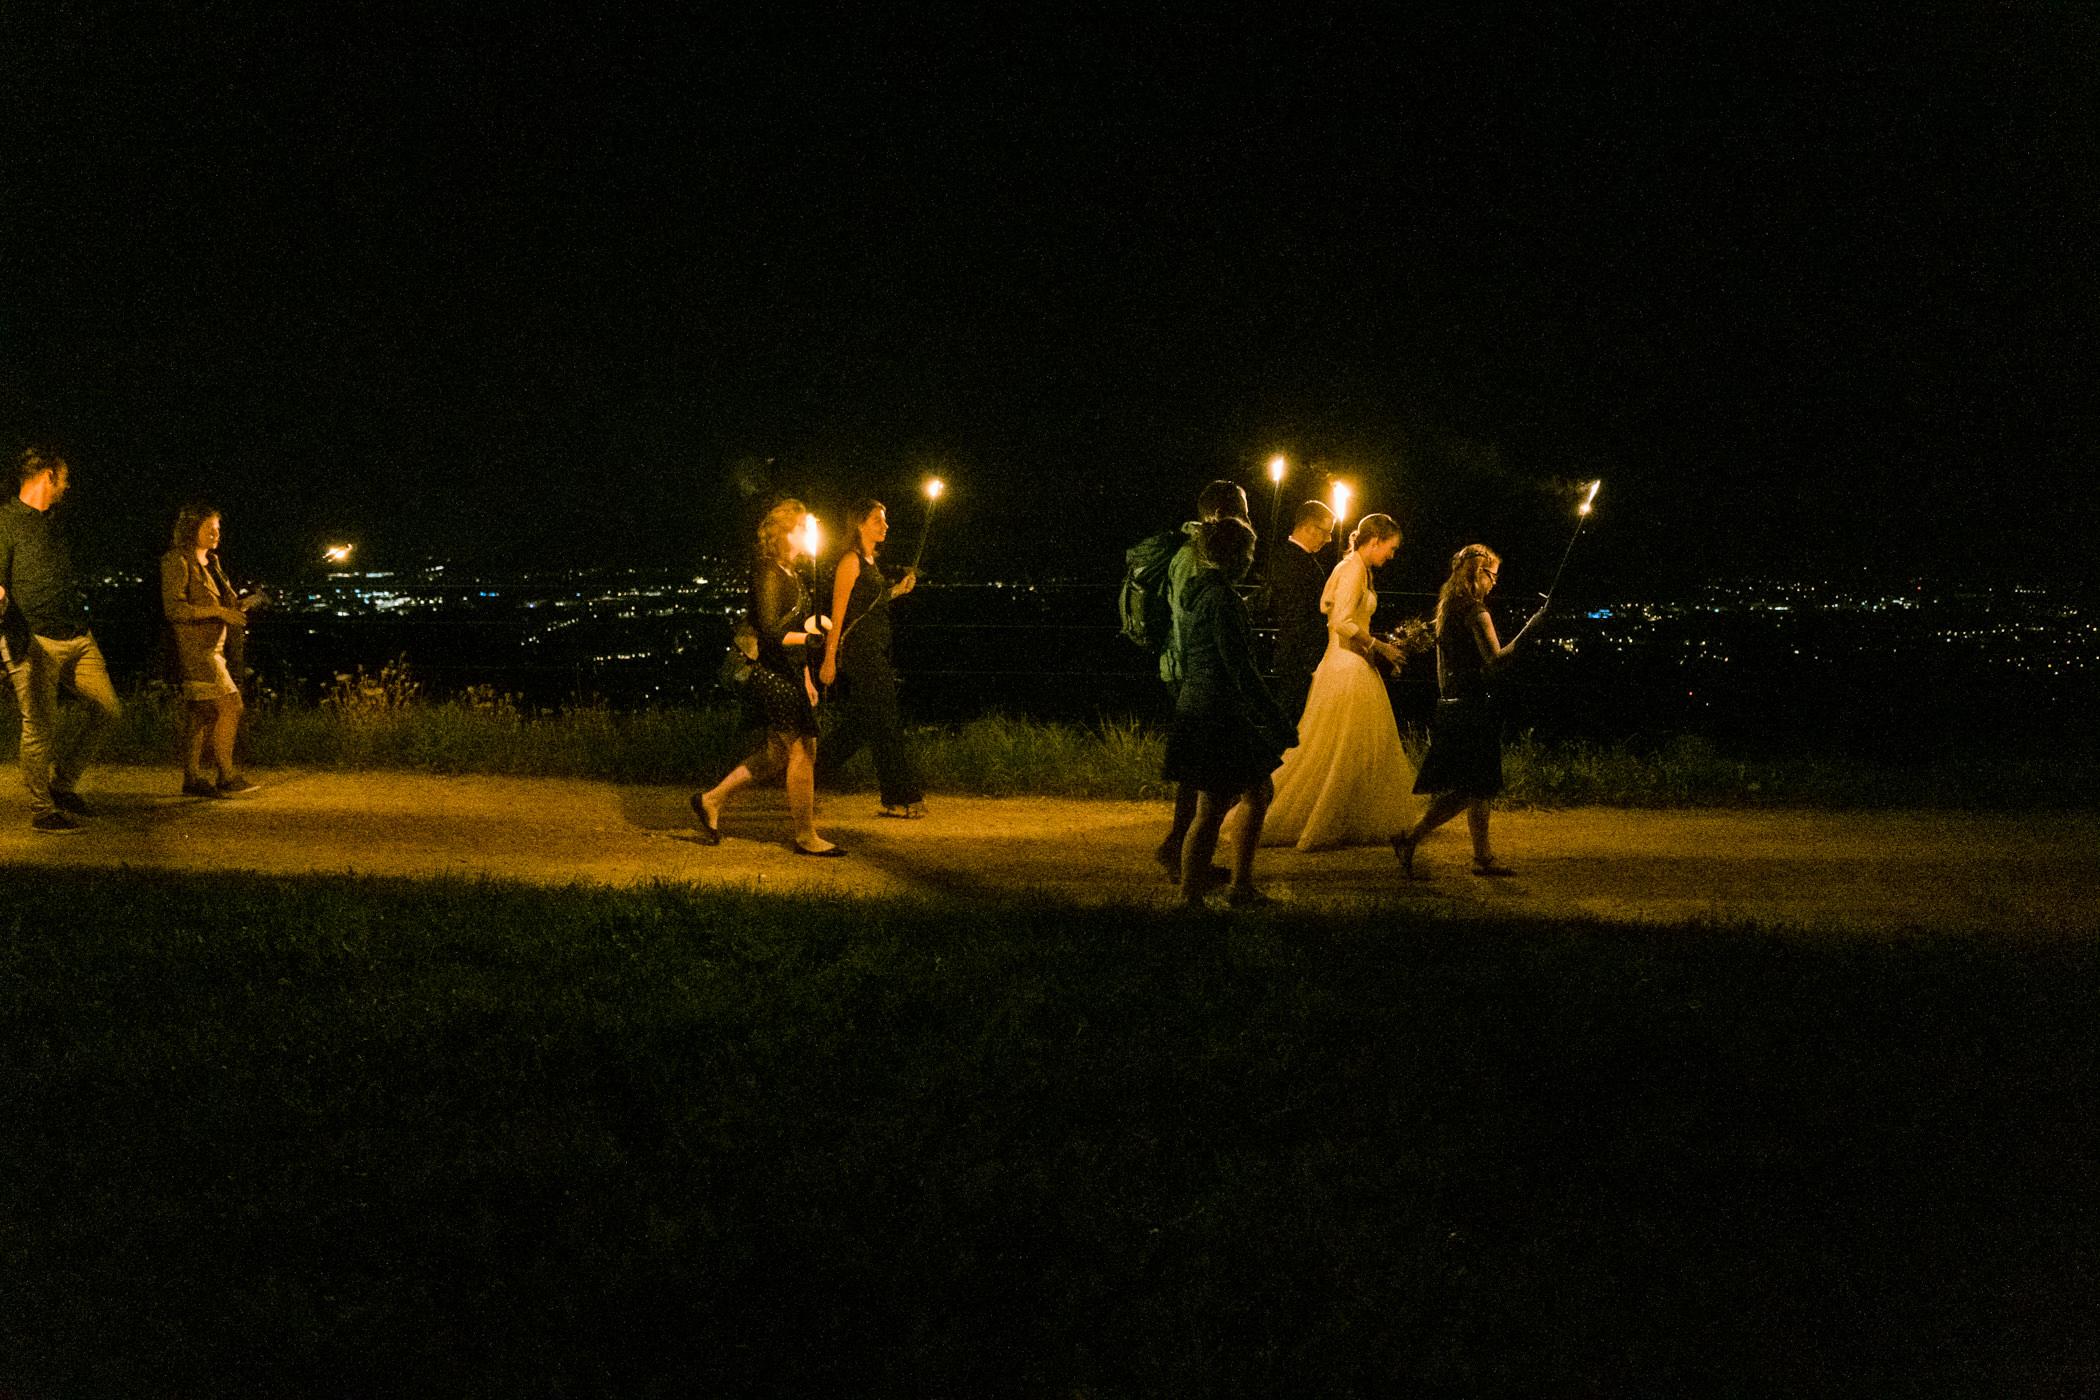 Fackelabzug Gurten Bern Hochzeitsgesellschaft